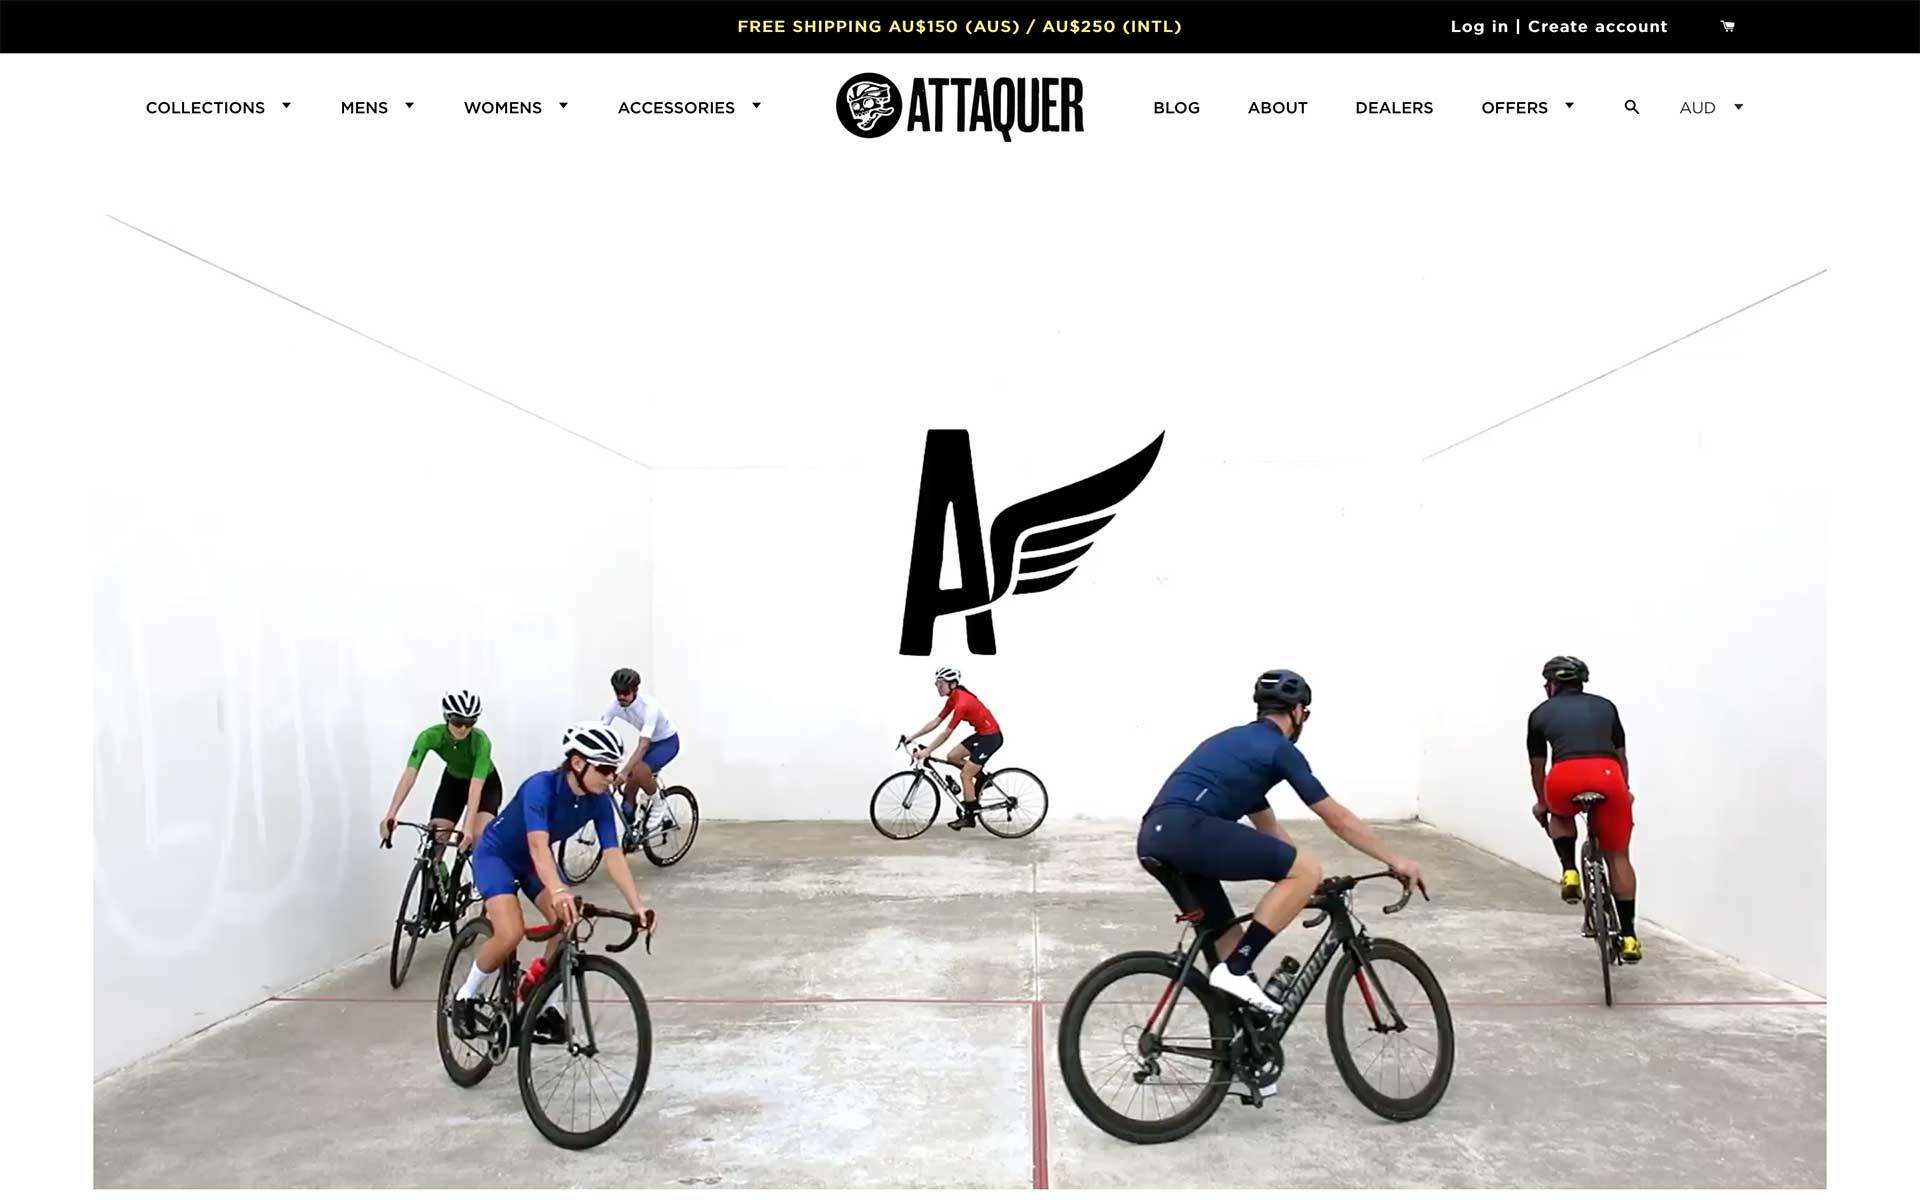 Attaquer 官方網站擷圖